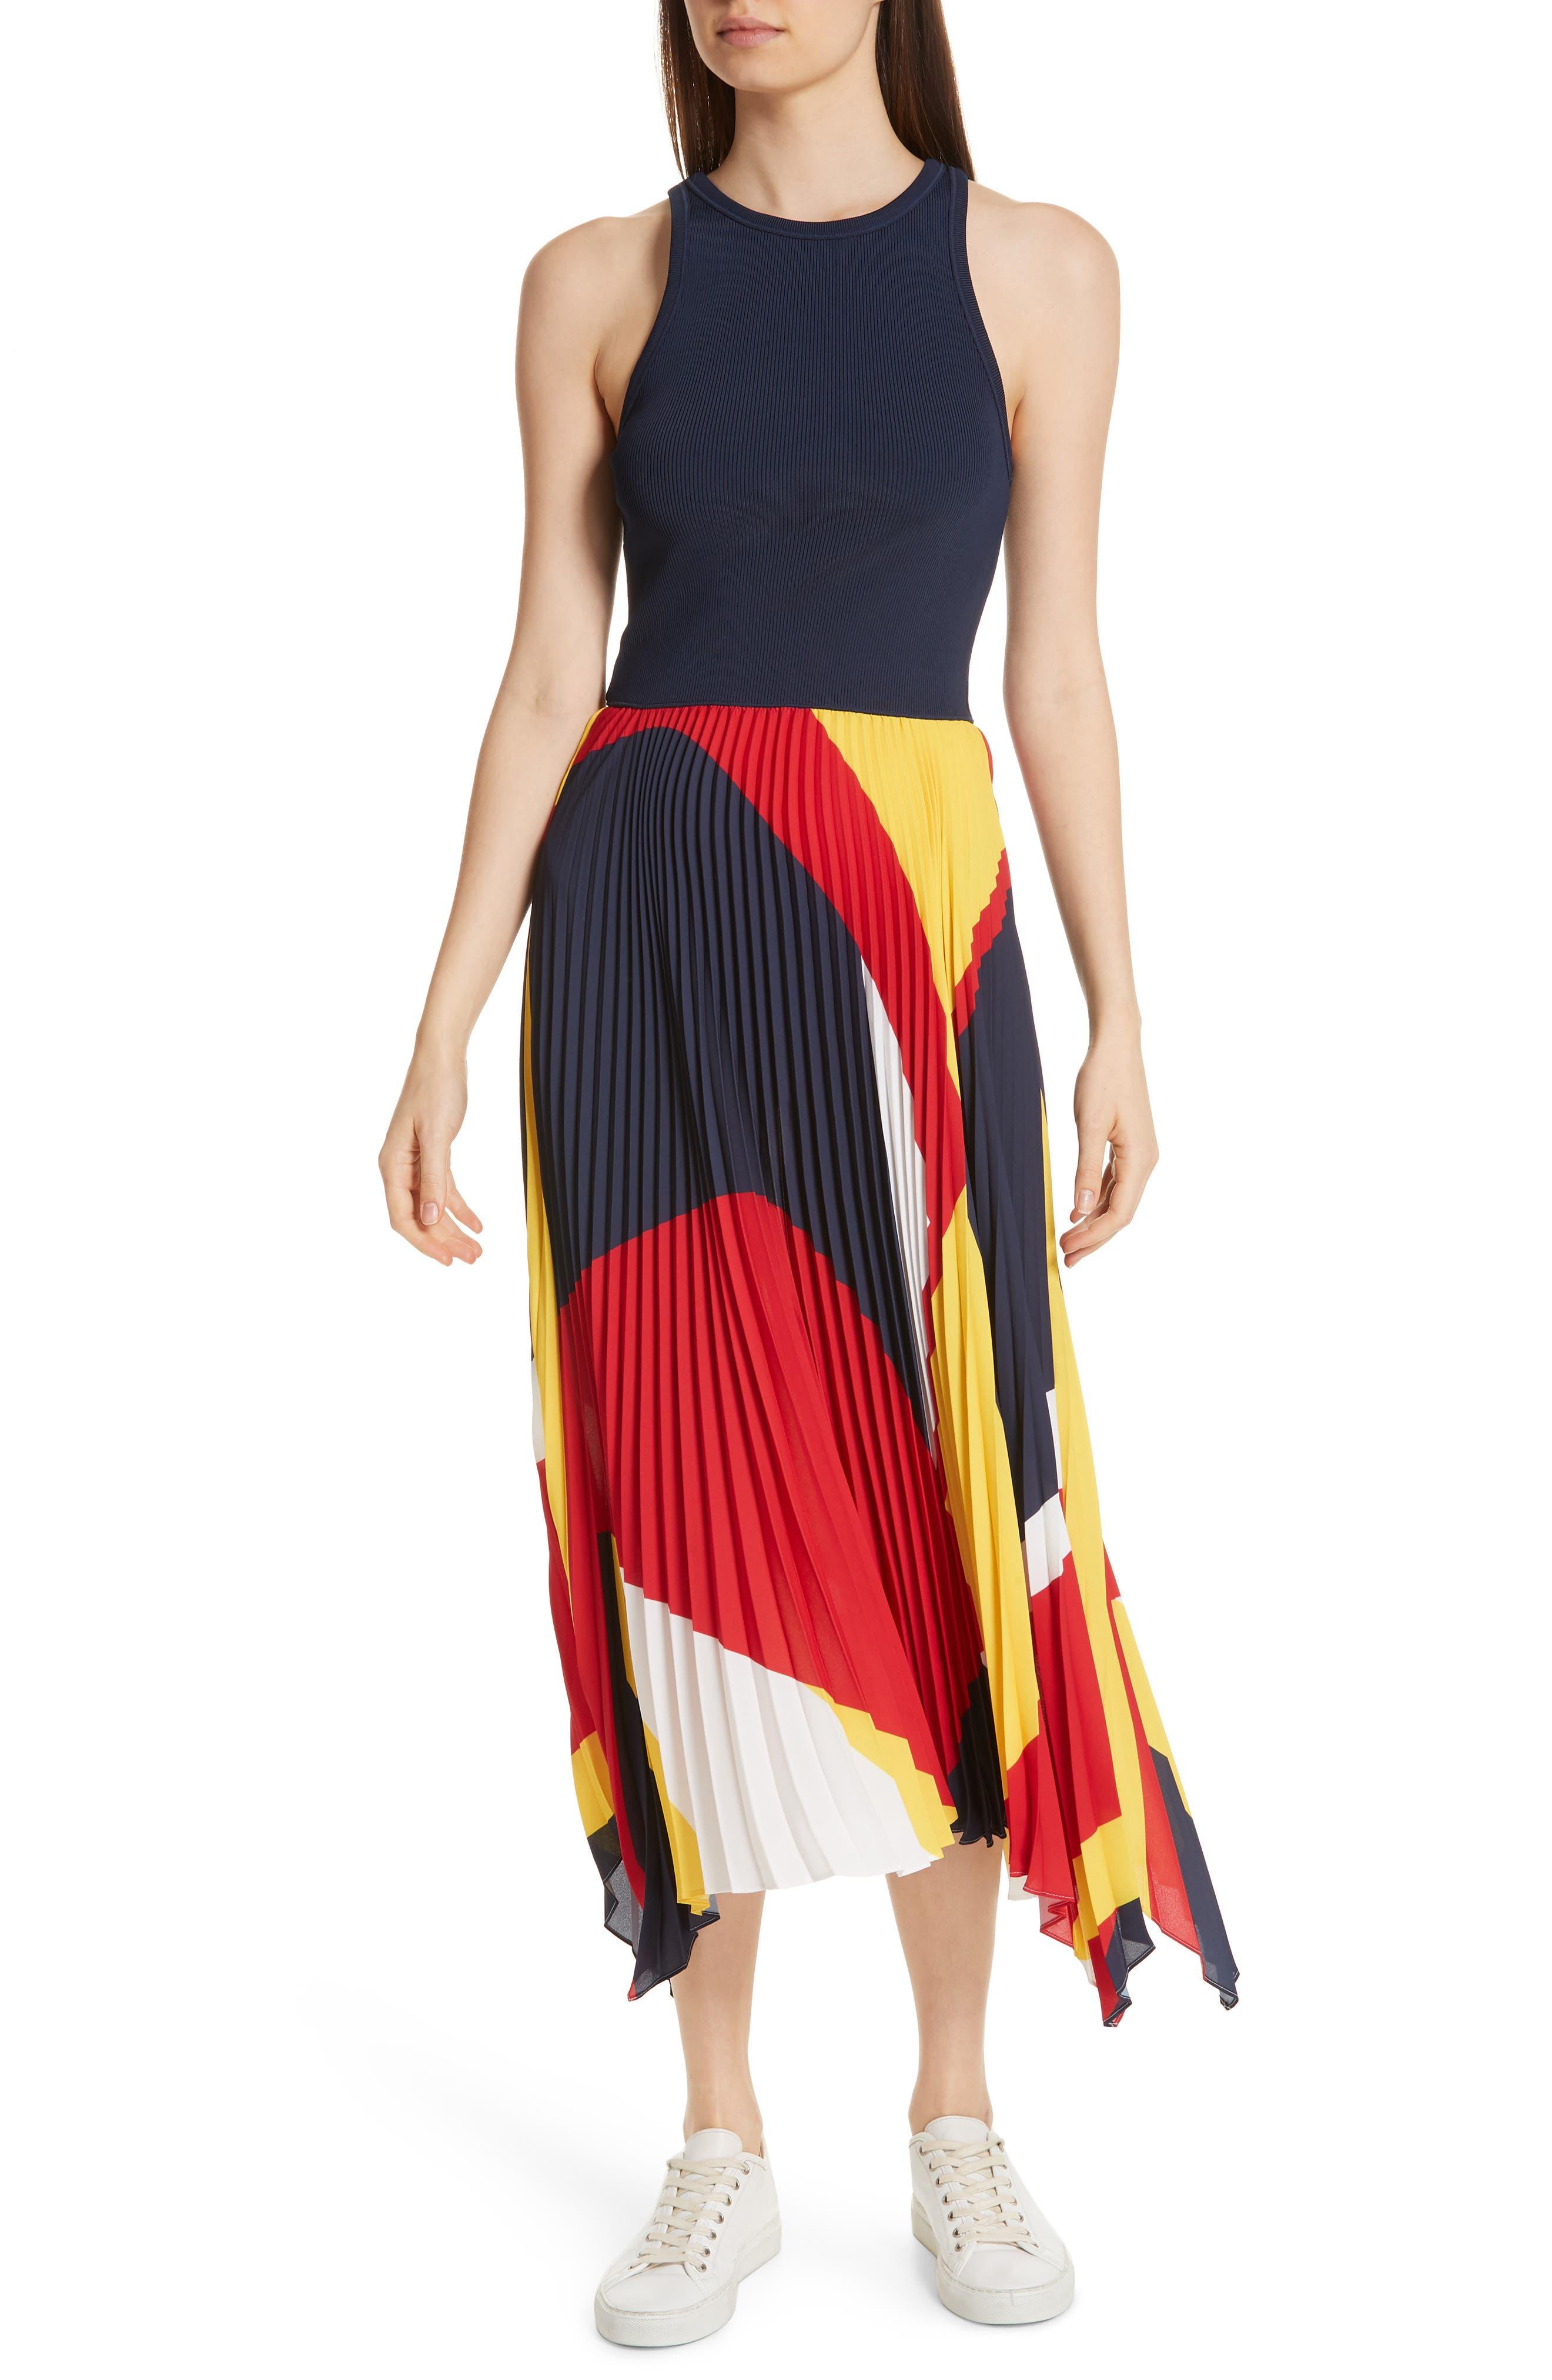 Alyah Mixed Media Dress,                             Main thumbnail 1, color,                             410